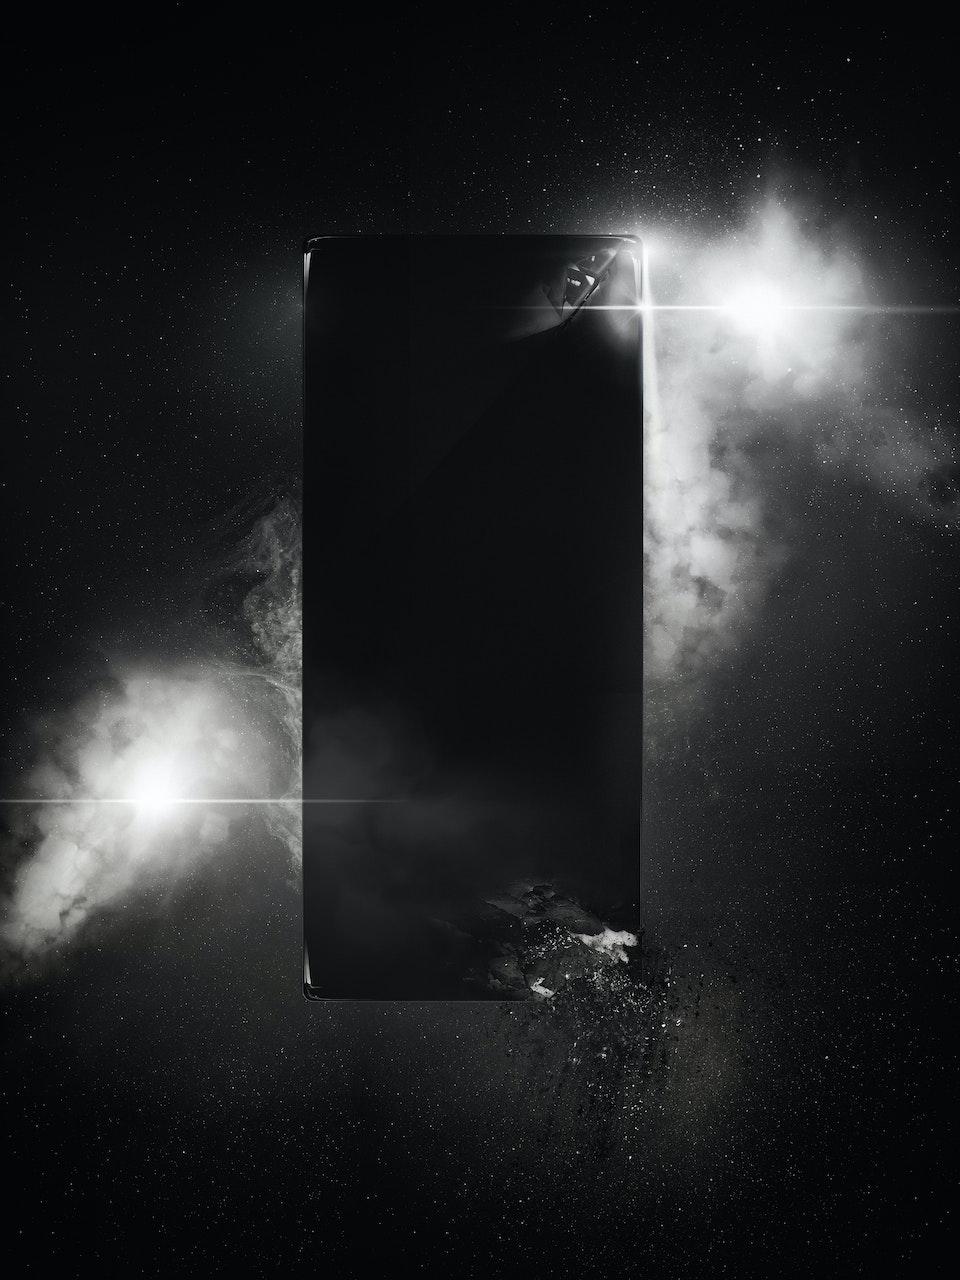 Monoliths_01 - Monolith I (2011)